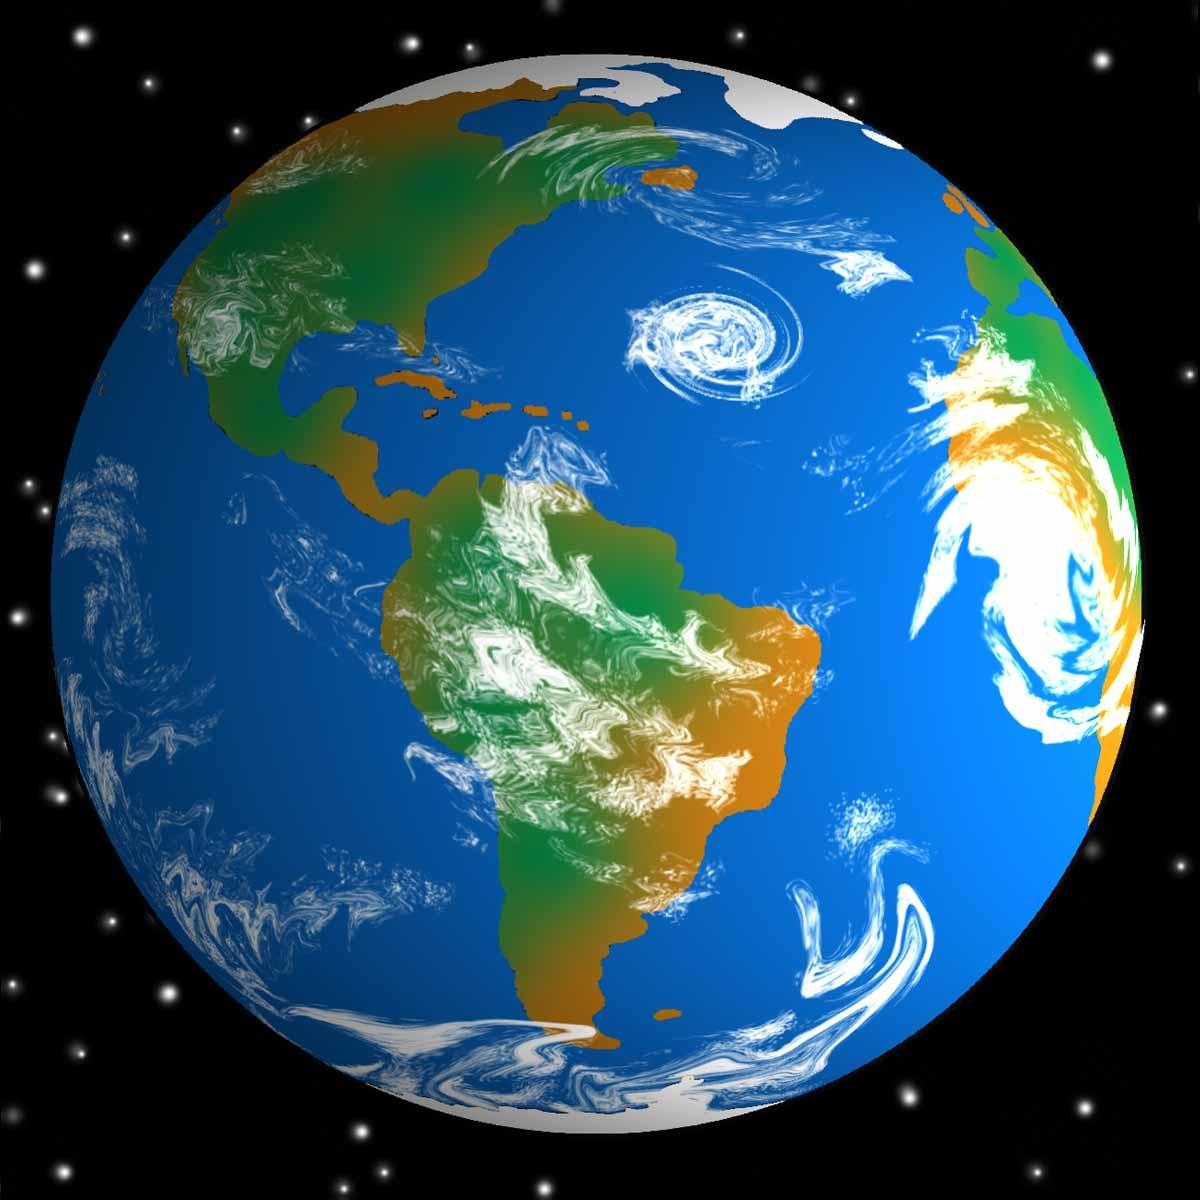 Planet clipart earth science 608 clip arts Illustrations PlanetenerdeClipArt